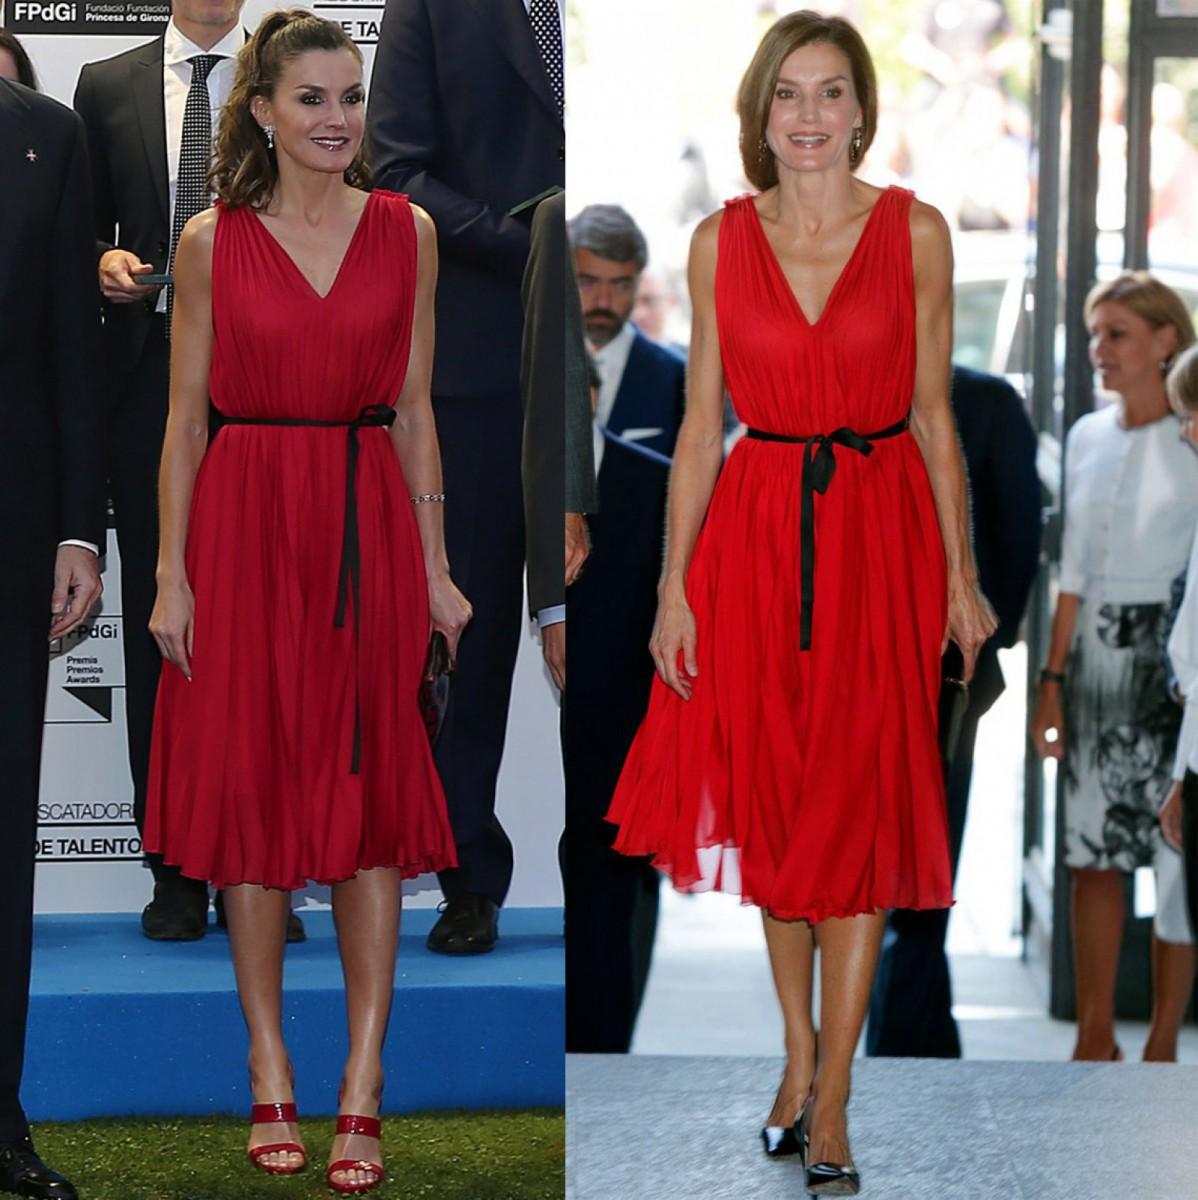 Carolina Herrera's red dress that Queen Letizia has worn at various events